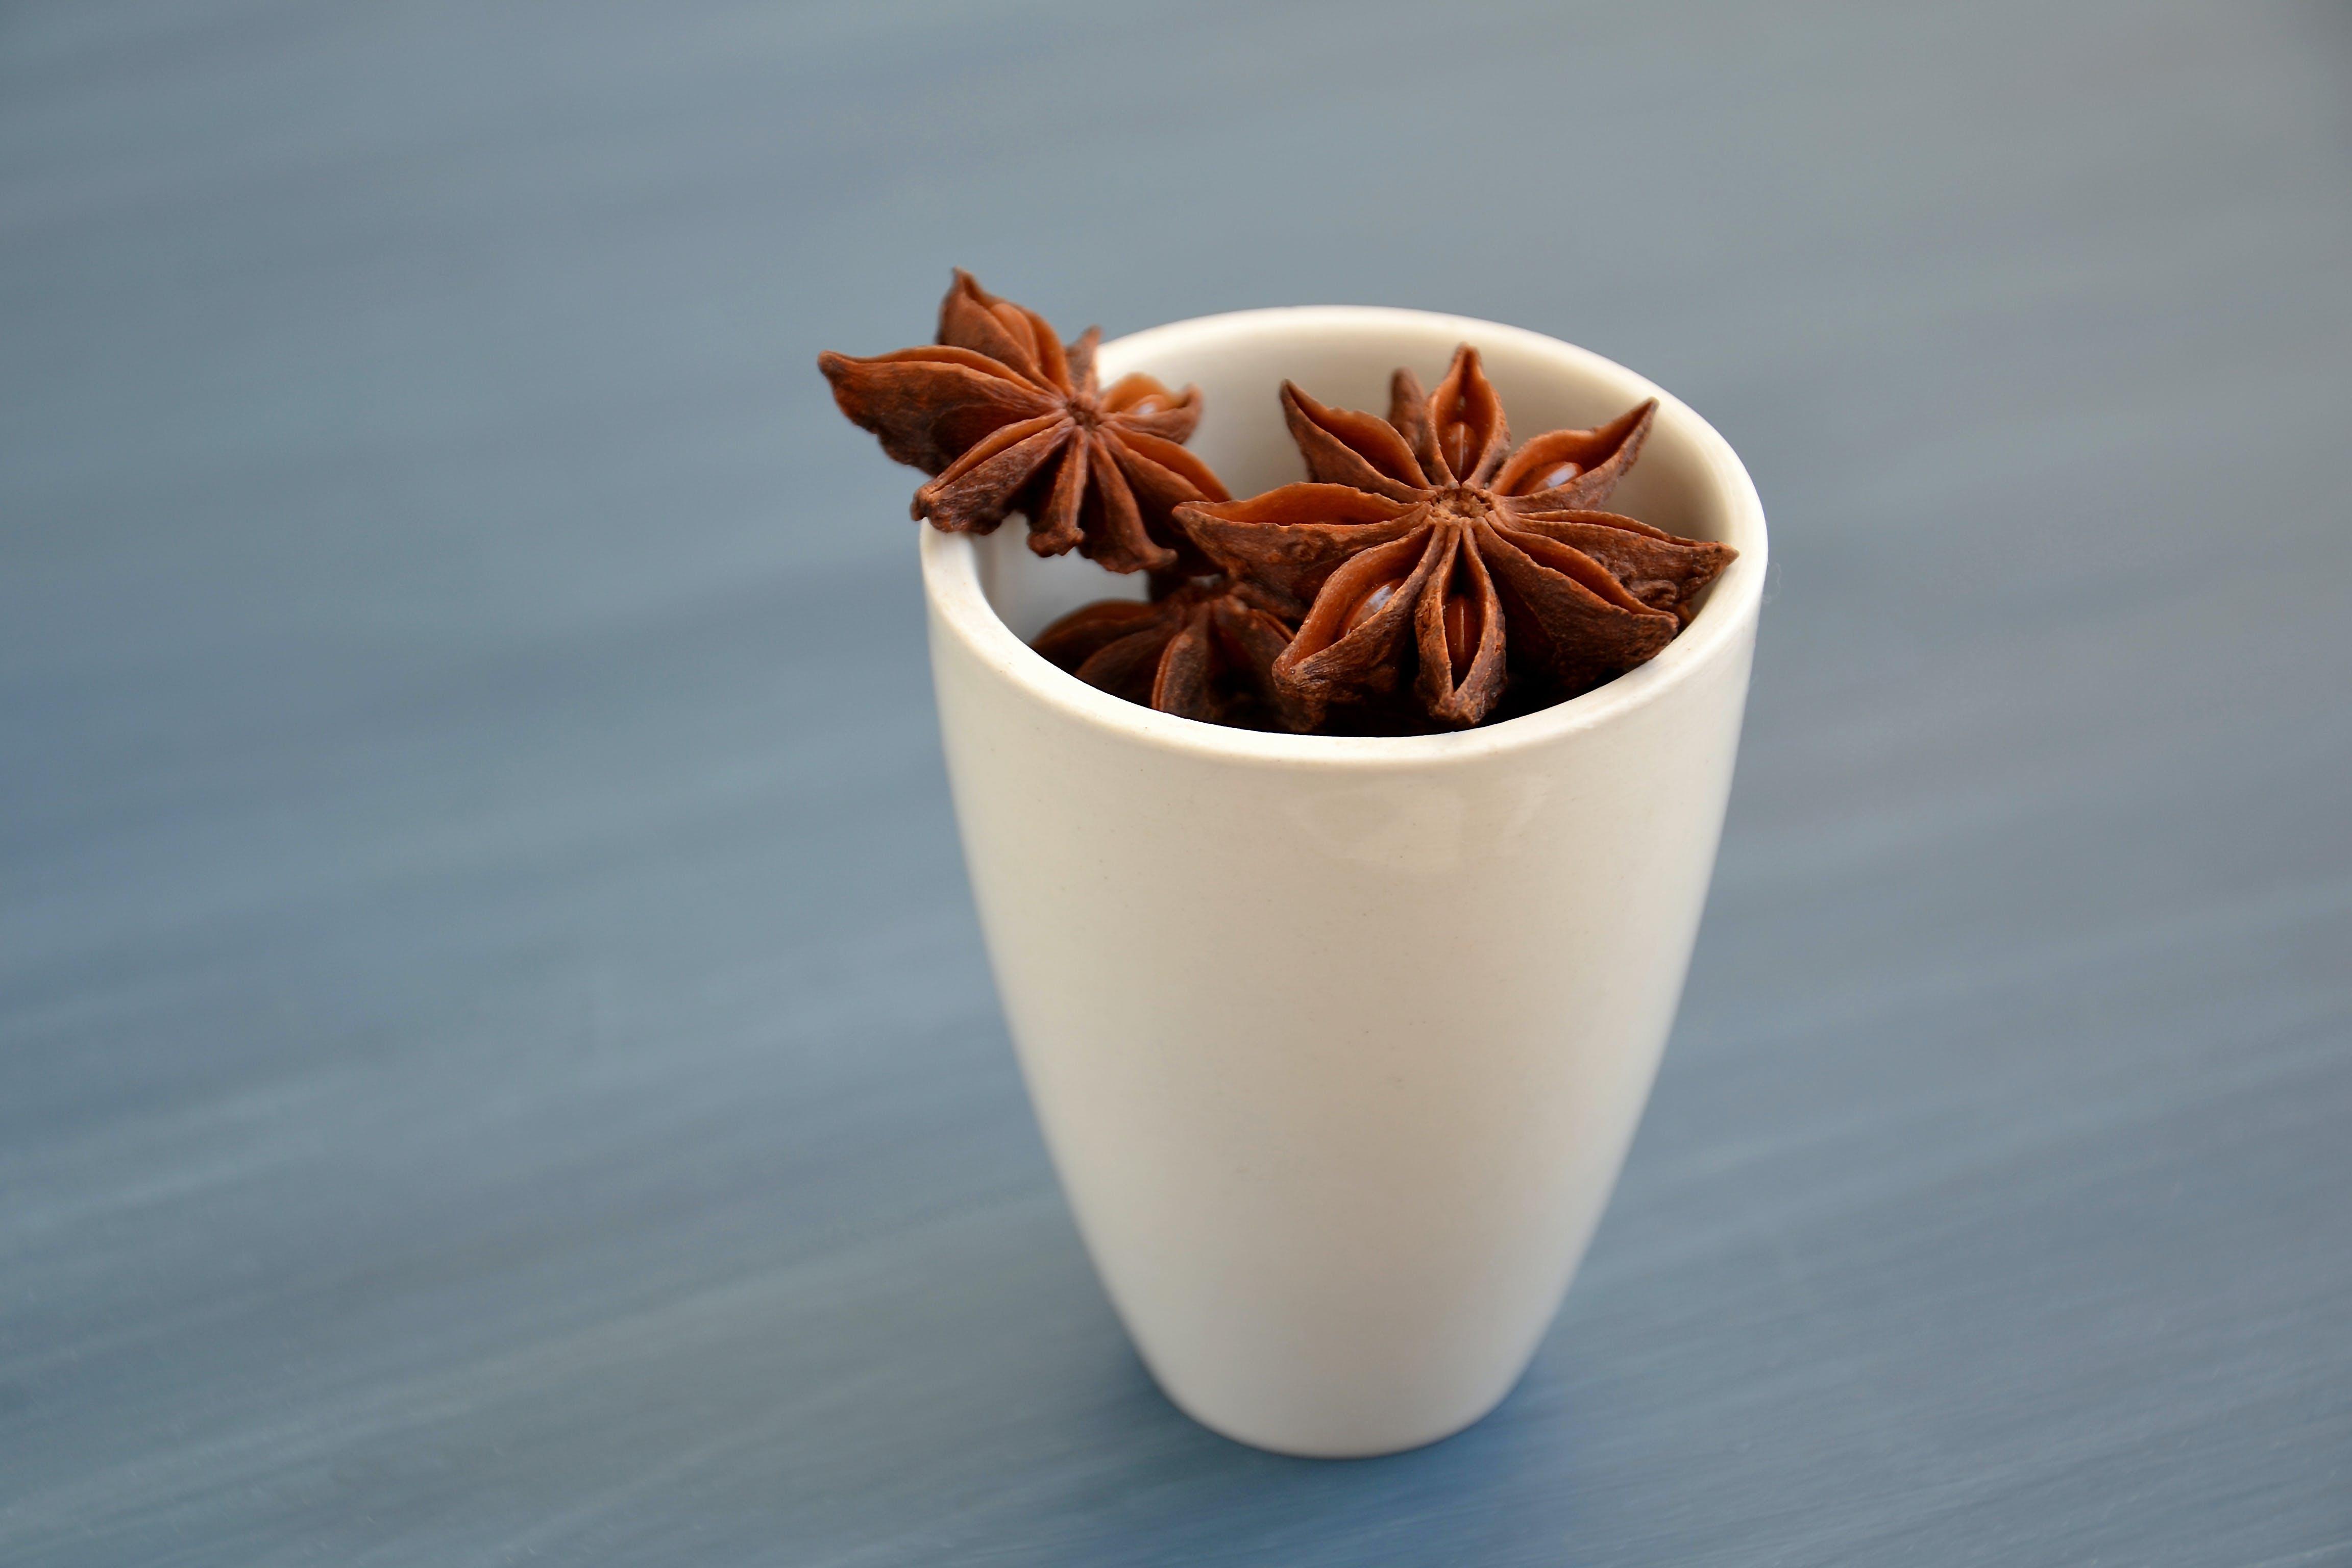 Brown Star Anise on White Ceramic Mug